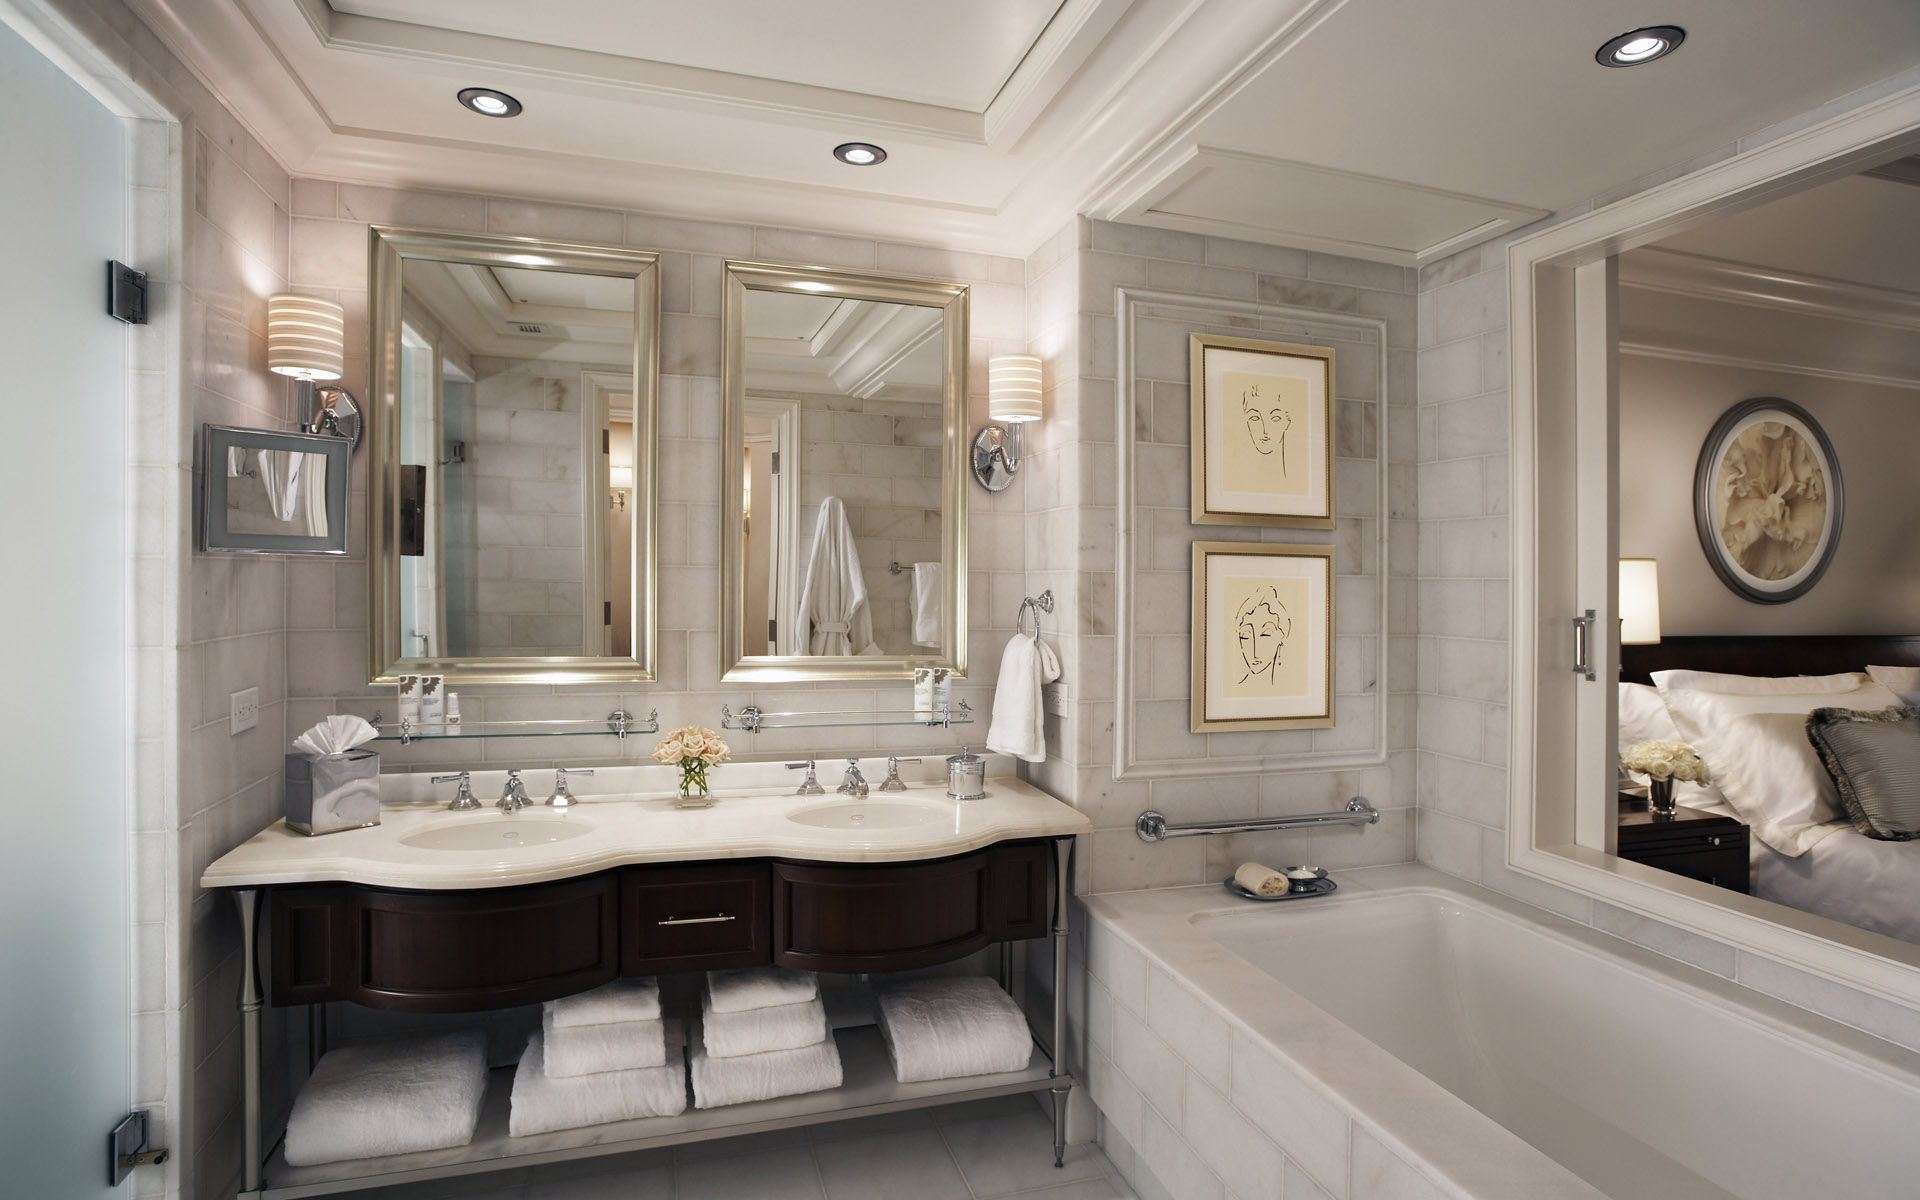 architecture-master-bathroom-floor-plans-room-design-ideas-flooring-house-designs-home-renovation-new-bathrooms-guest-how-to-ensuite-tile-interior-designer-bath-design-gallery-restroom-design.jpg